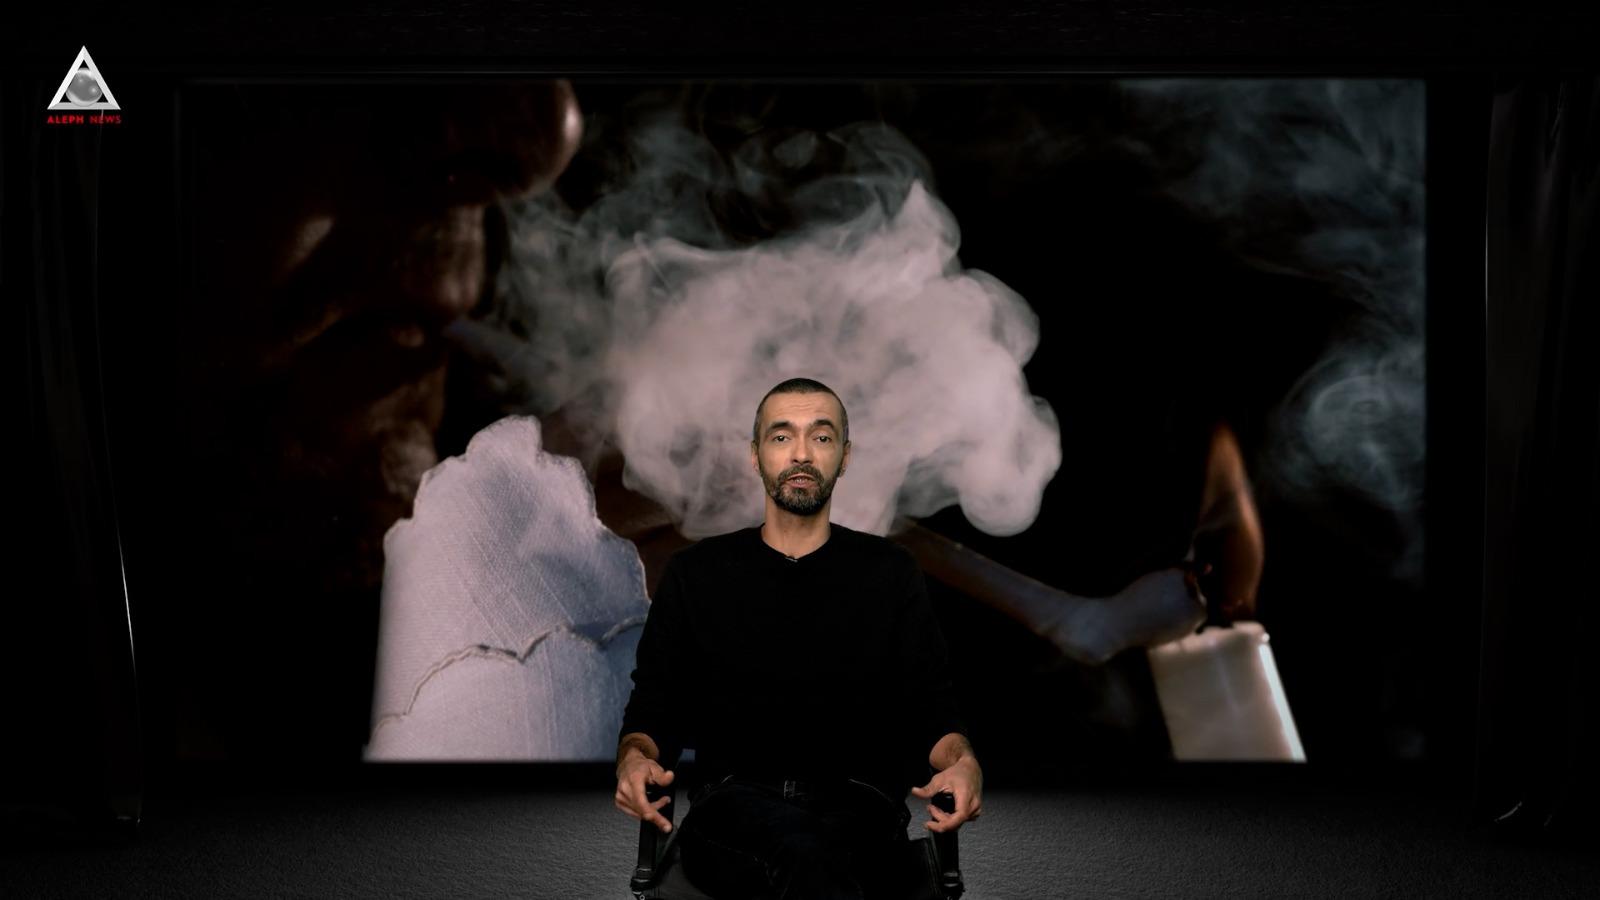 CINEMAleph. Addicted to Pleasure: Tobacco